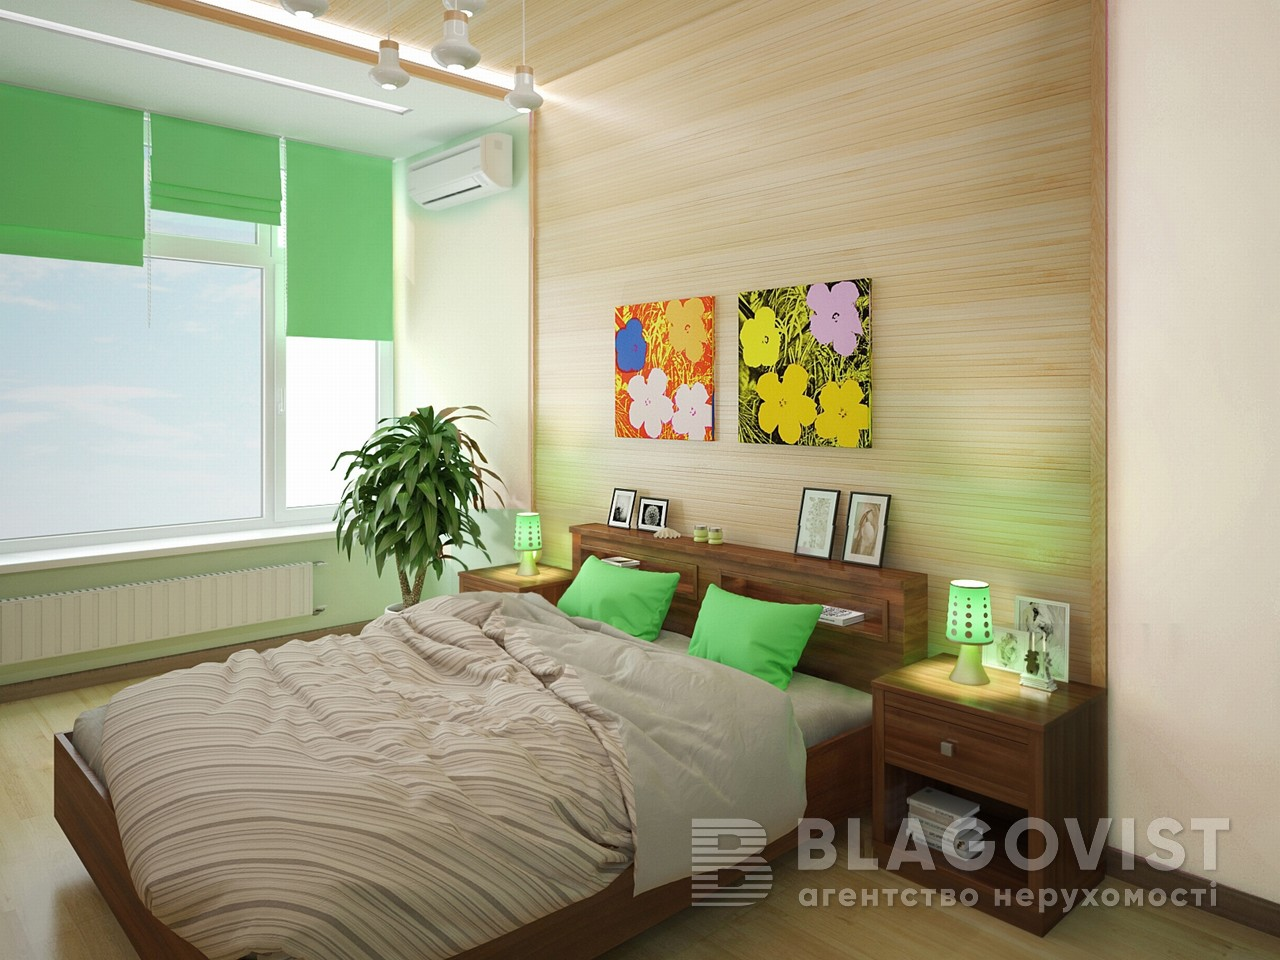 Квартира Z-138868, Парково-Сырецкая (Шамрыло Тимофея), 4в, Киев - Фото 7